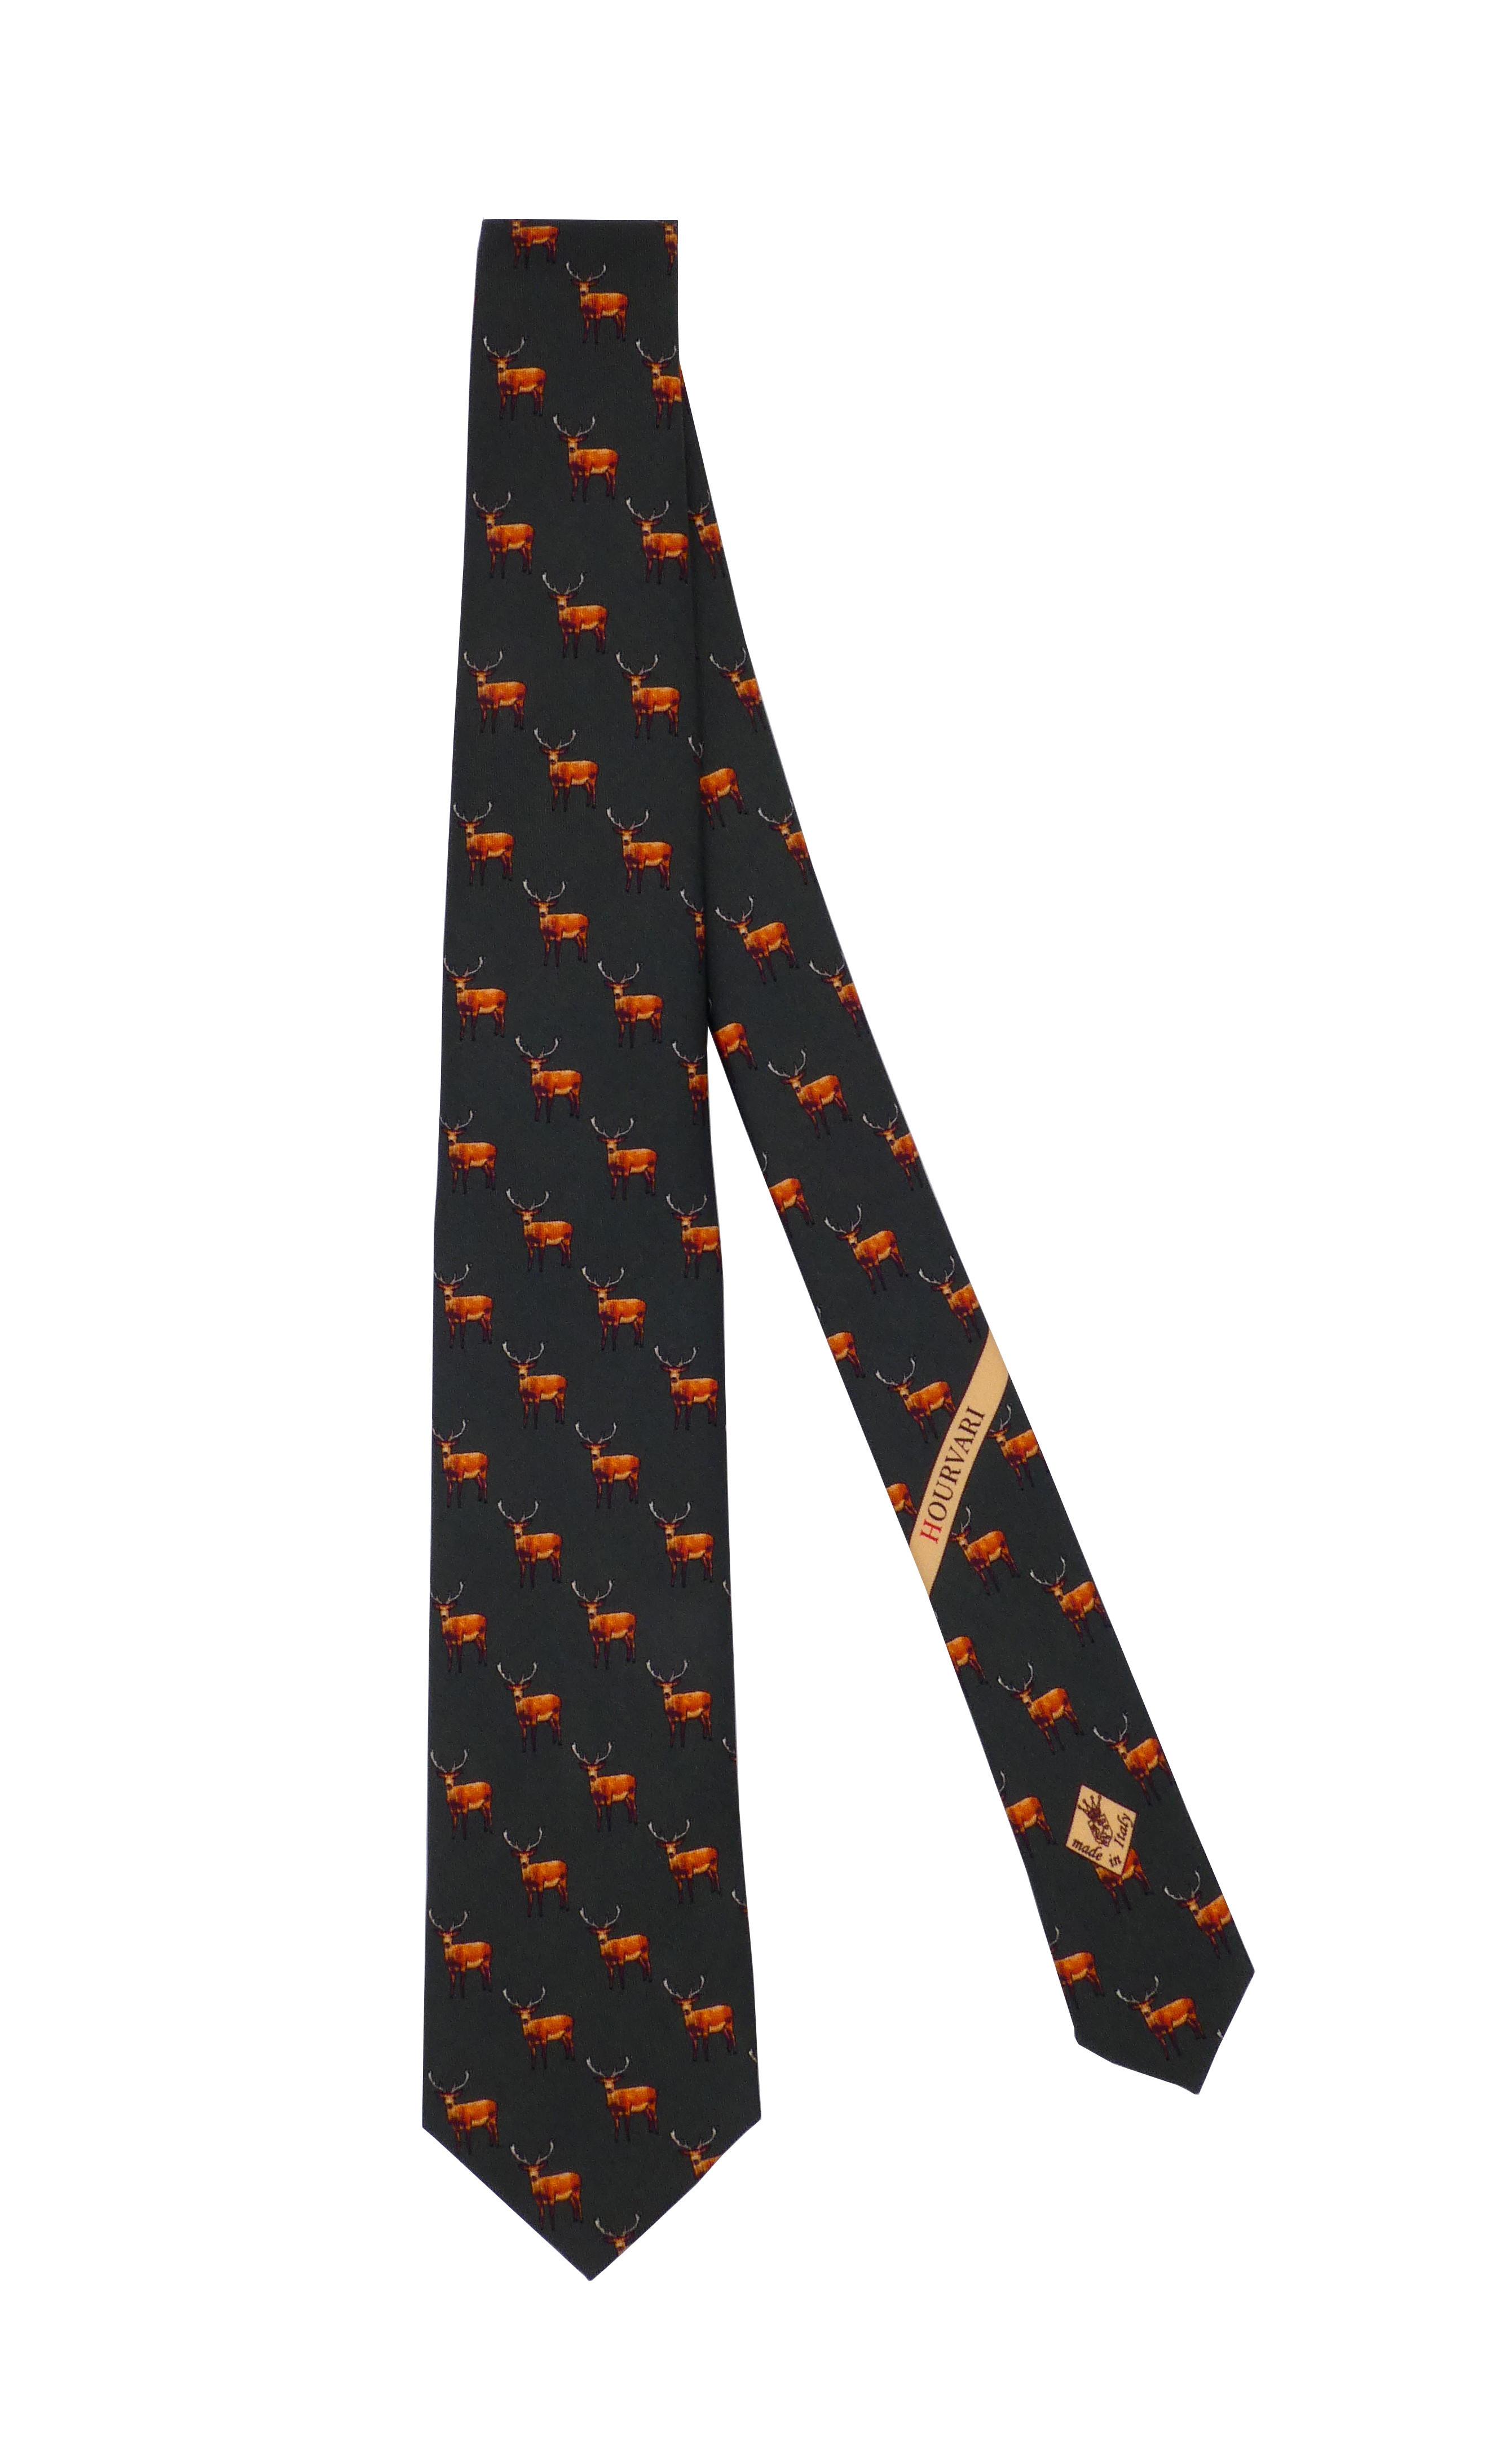 Cravate de chasse en soie cerf